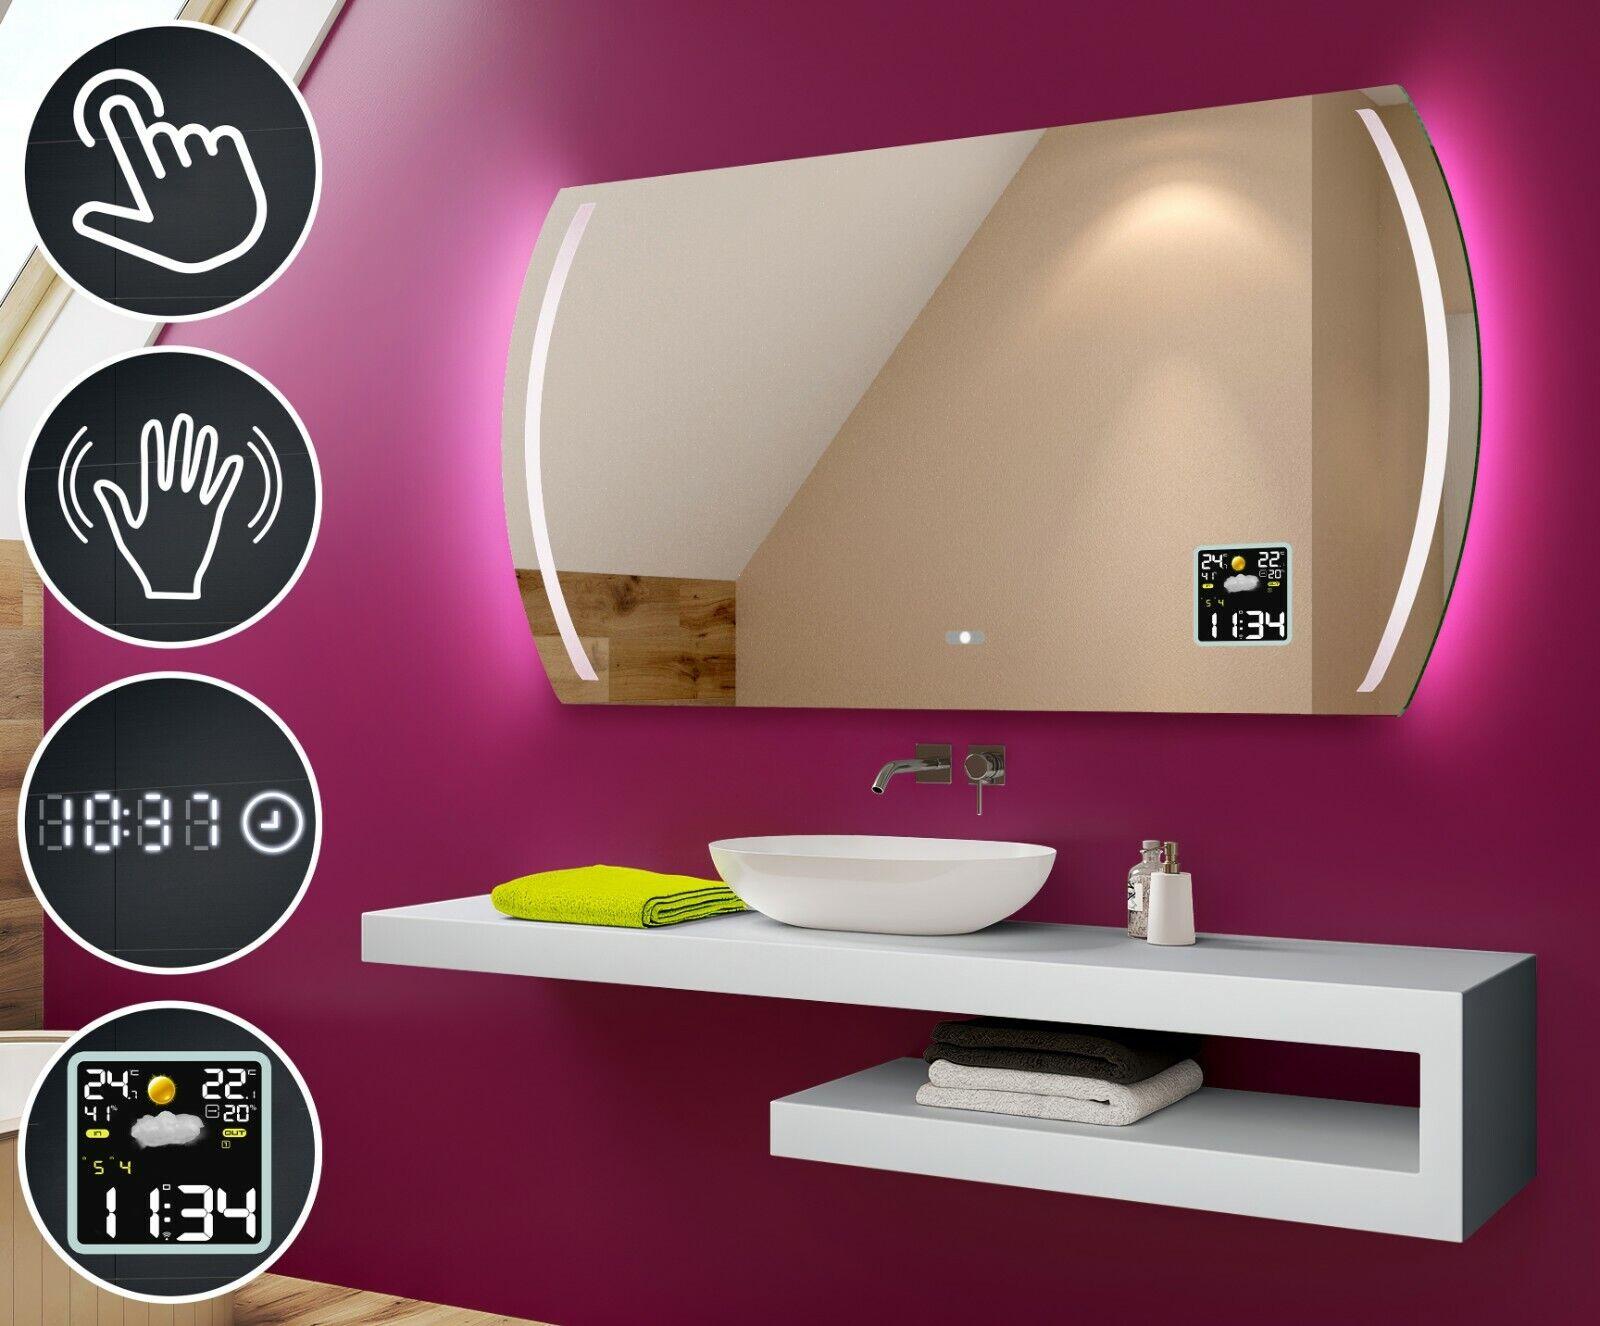 LED Illuminated Bathroom Mirror   L67   Switch   Accessories   Blautooth Speaker